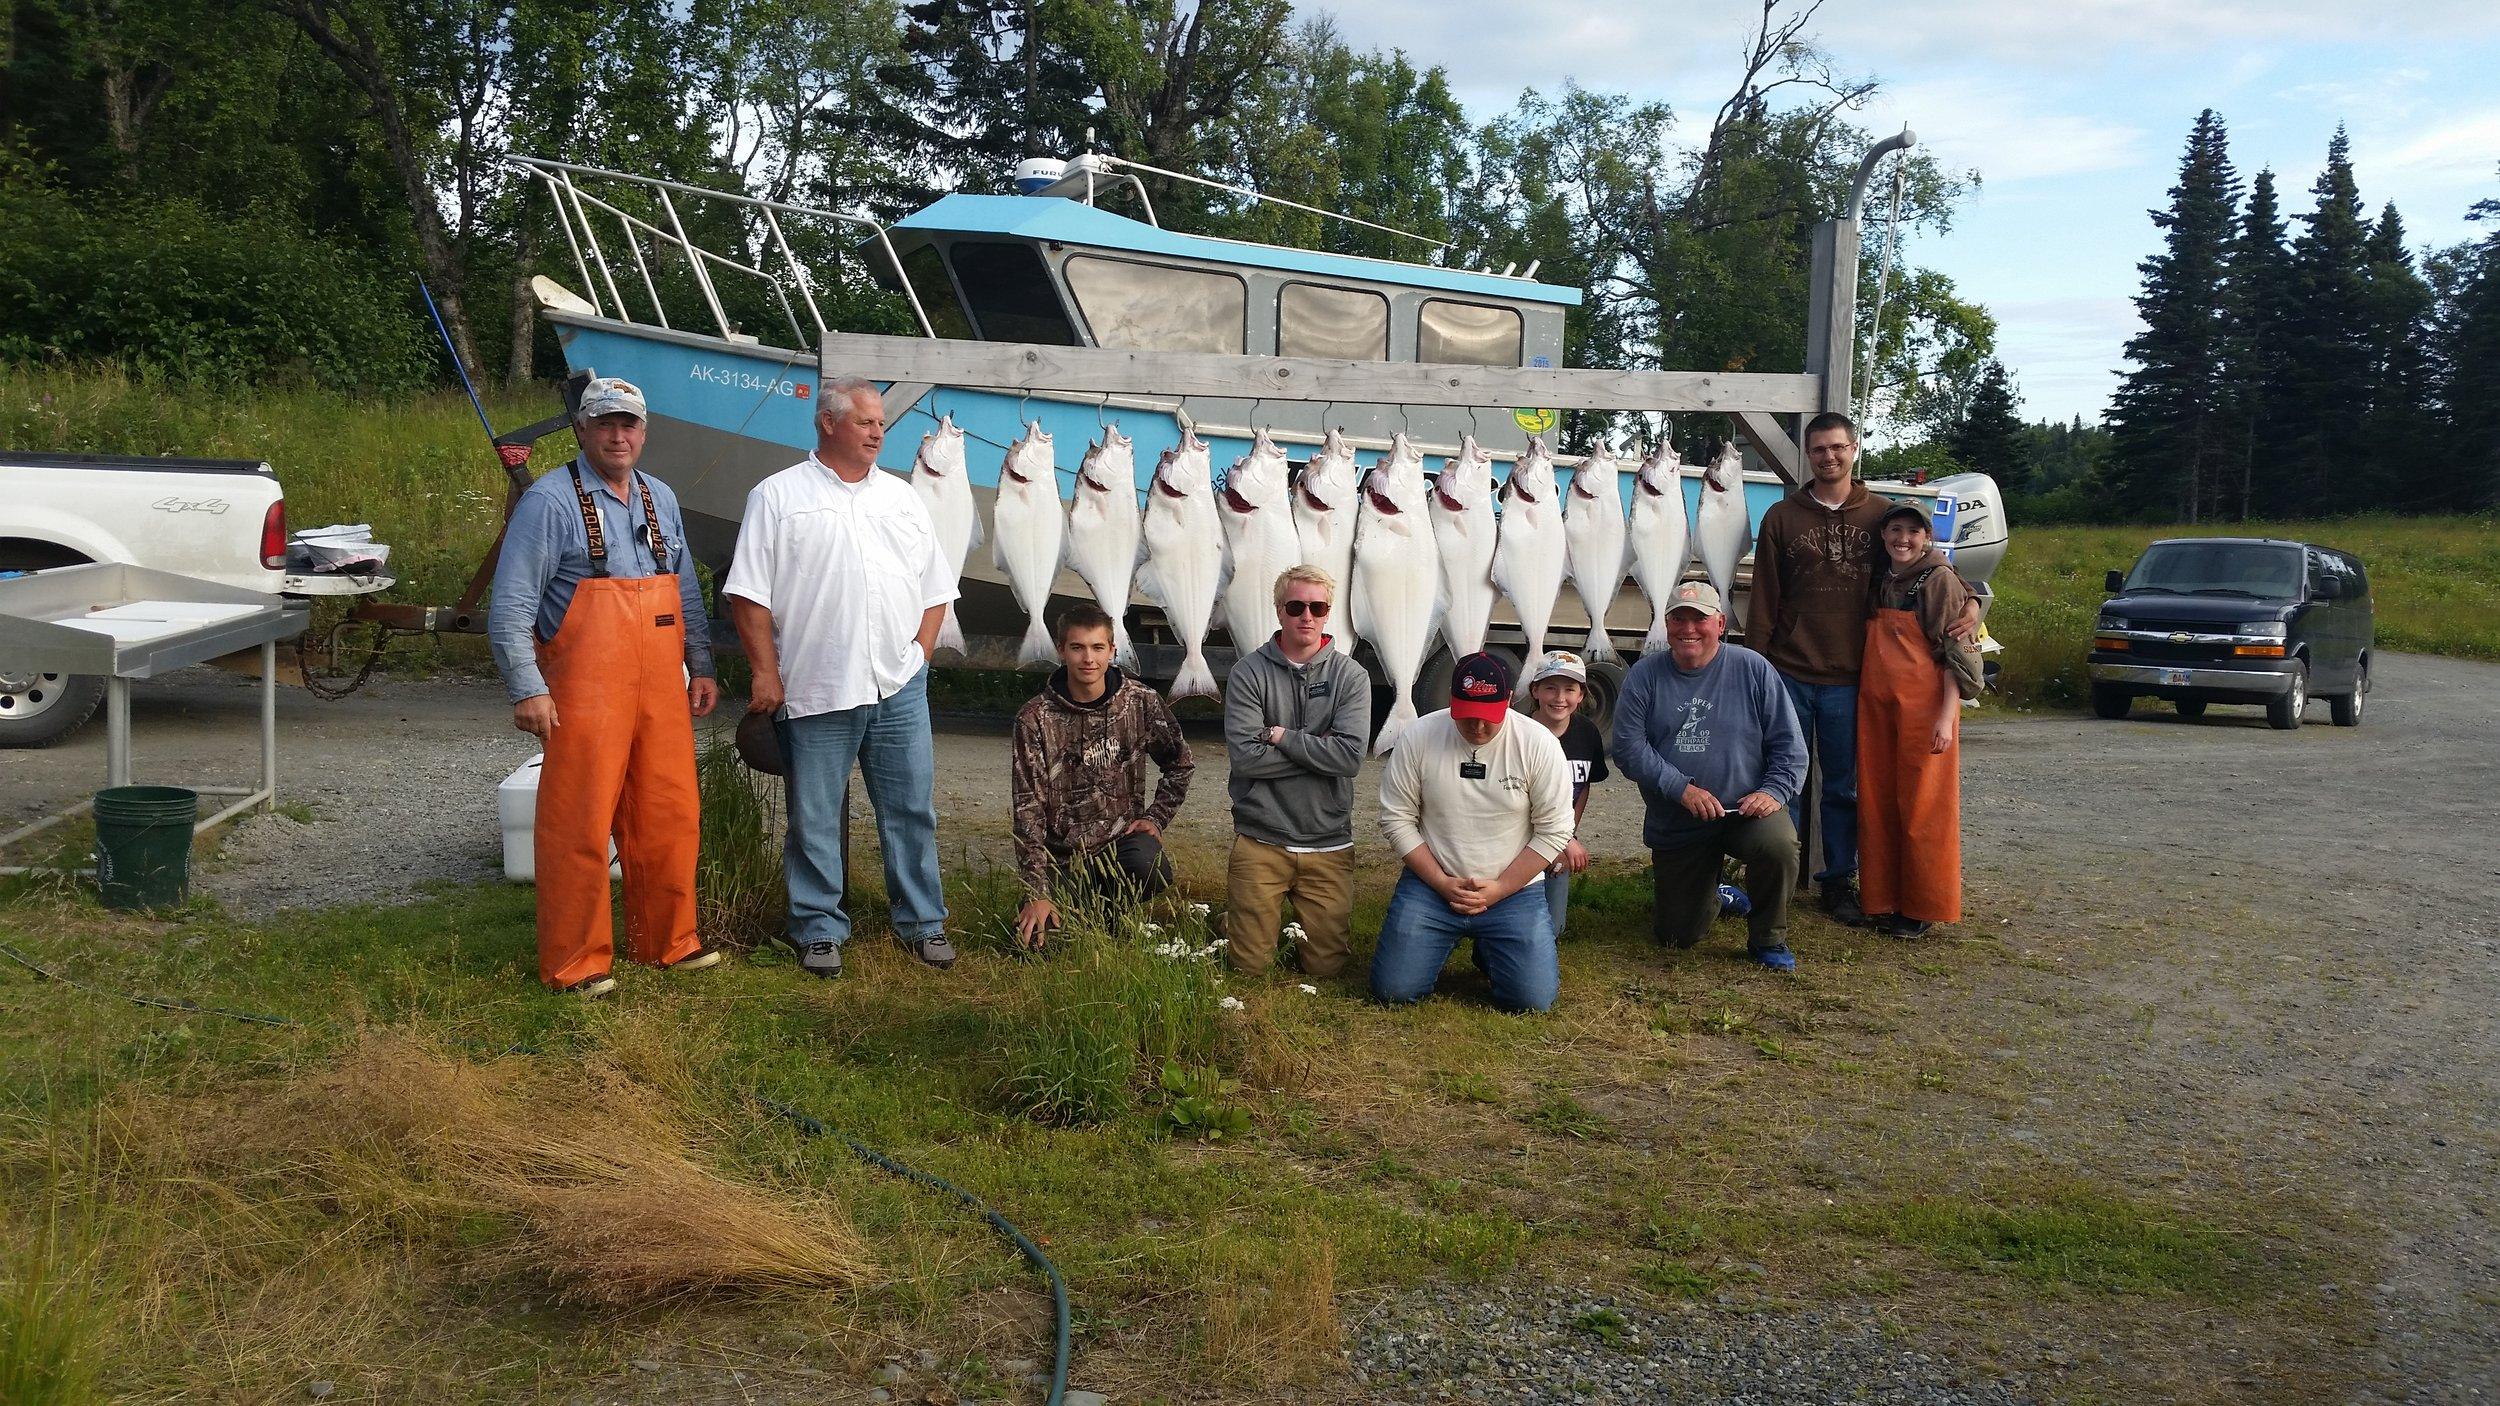 halibut fishing out of ninilchik or homer (Alaskan thunderod fishing adventures shown here)